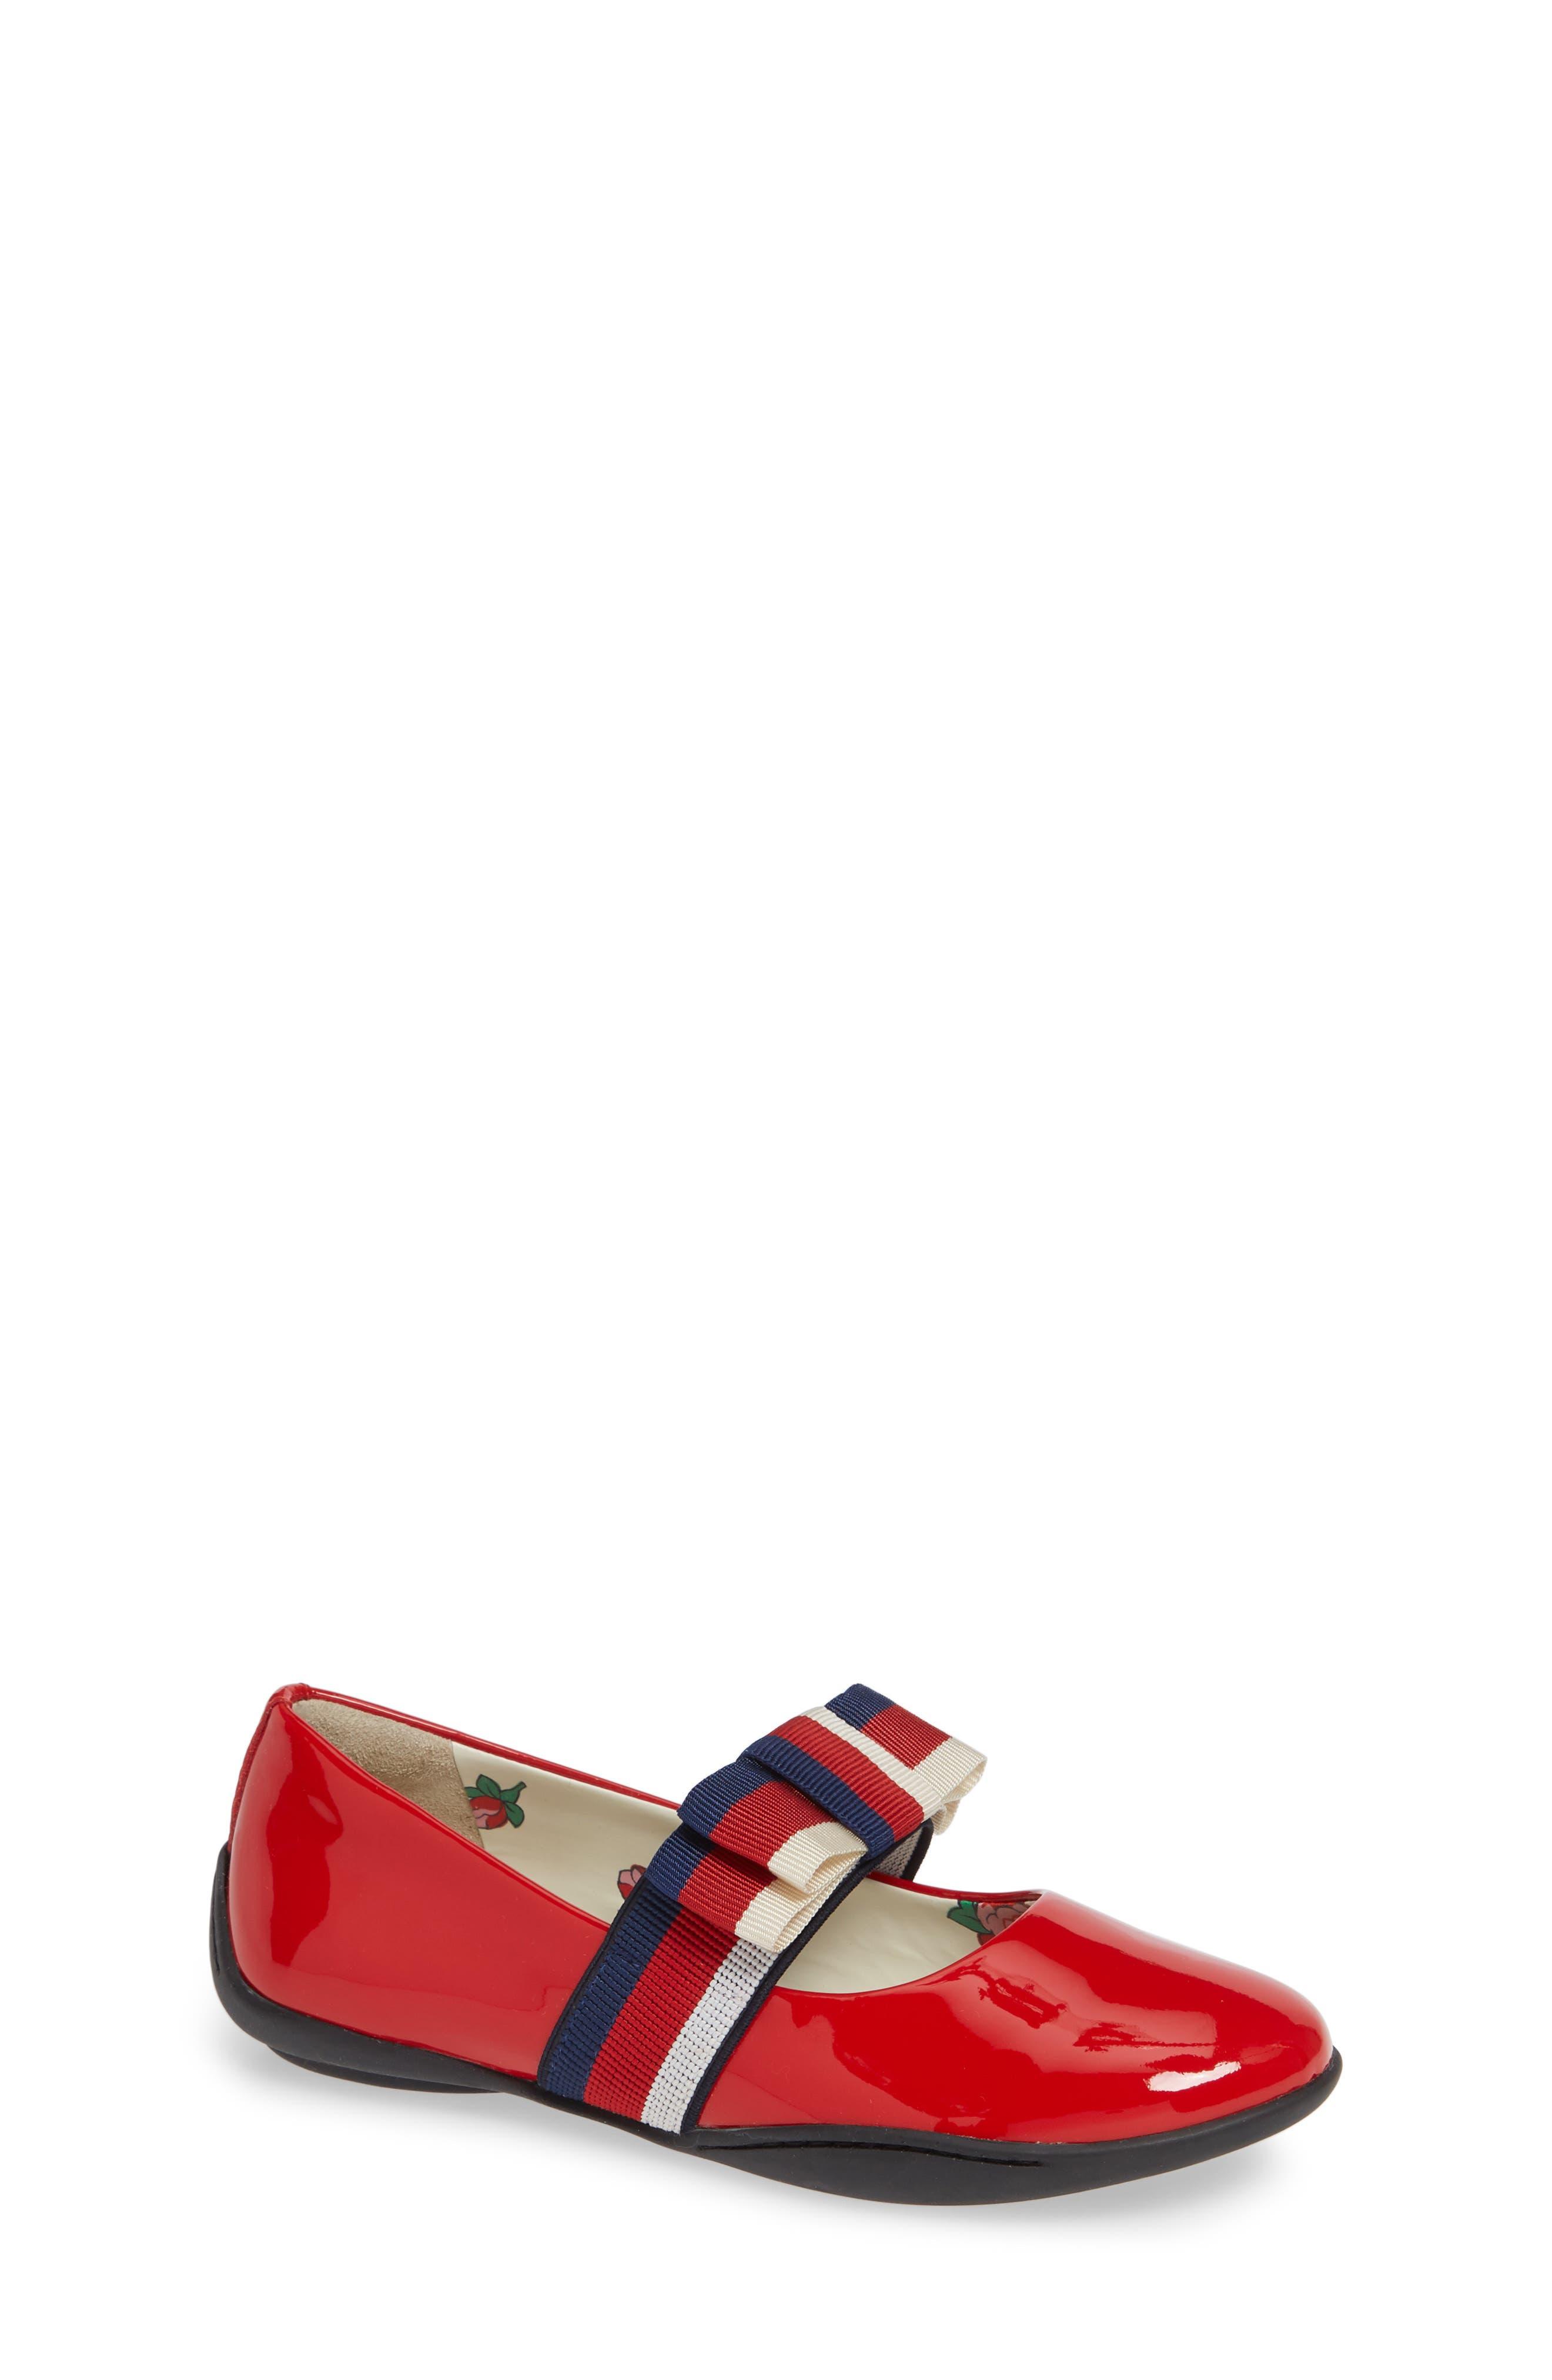 eeb33b548278 Toddler Girls  Gucci Shoes (Sizes 7.5-12)